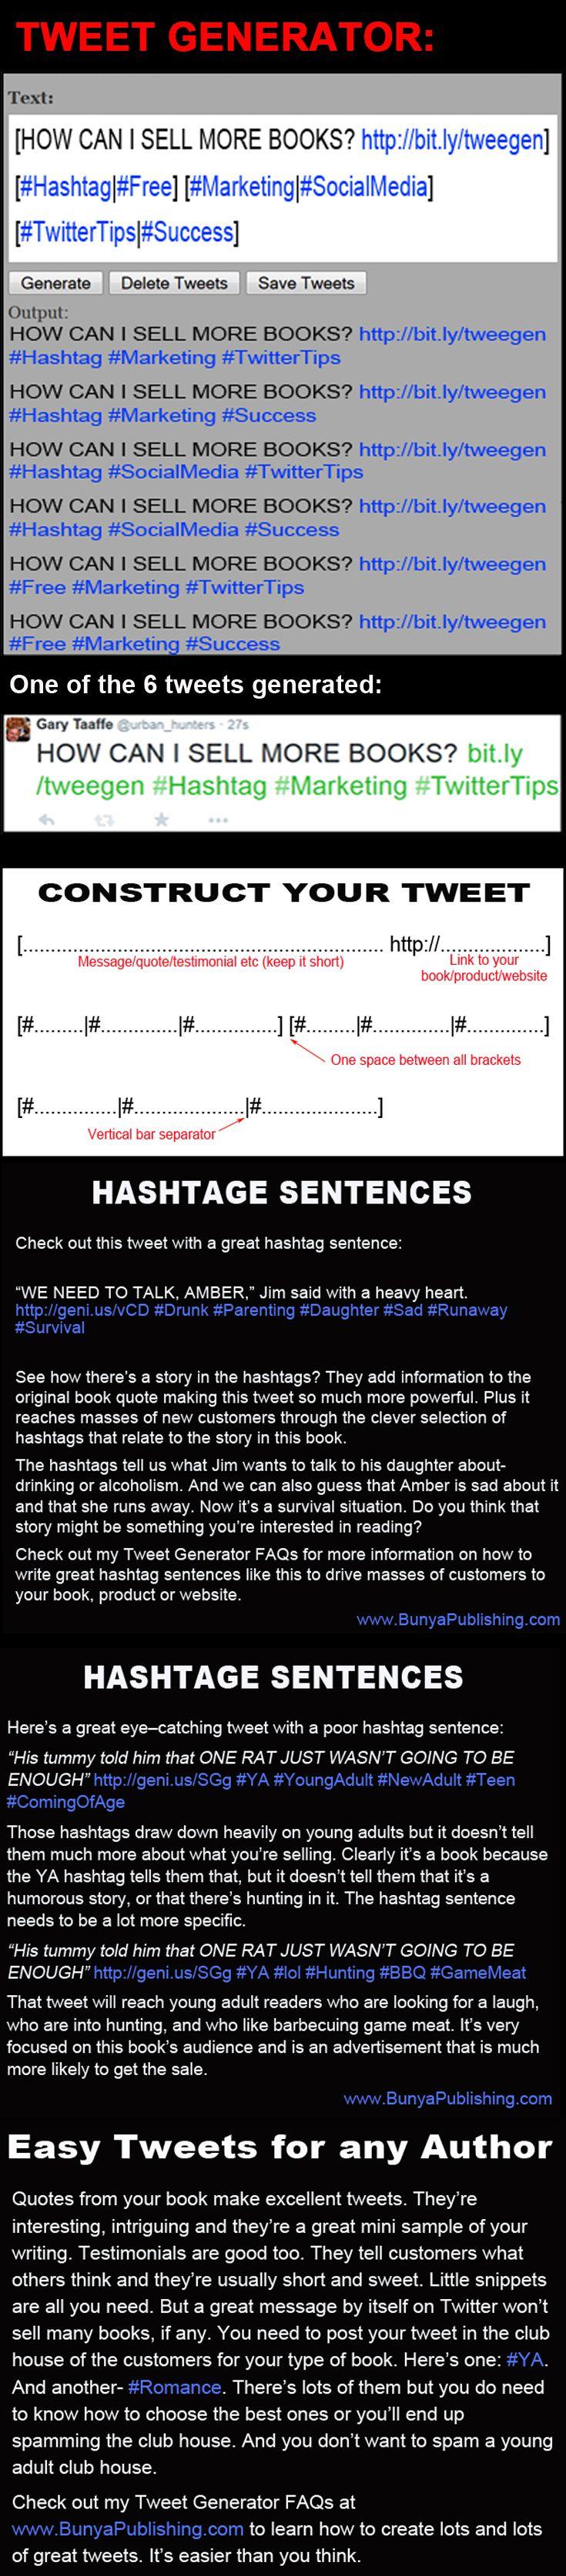 Tweet Generator for great author marketing on Twitter. http://bunyapublishing.com/ https://www.pinterest.com/garytaaffe/